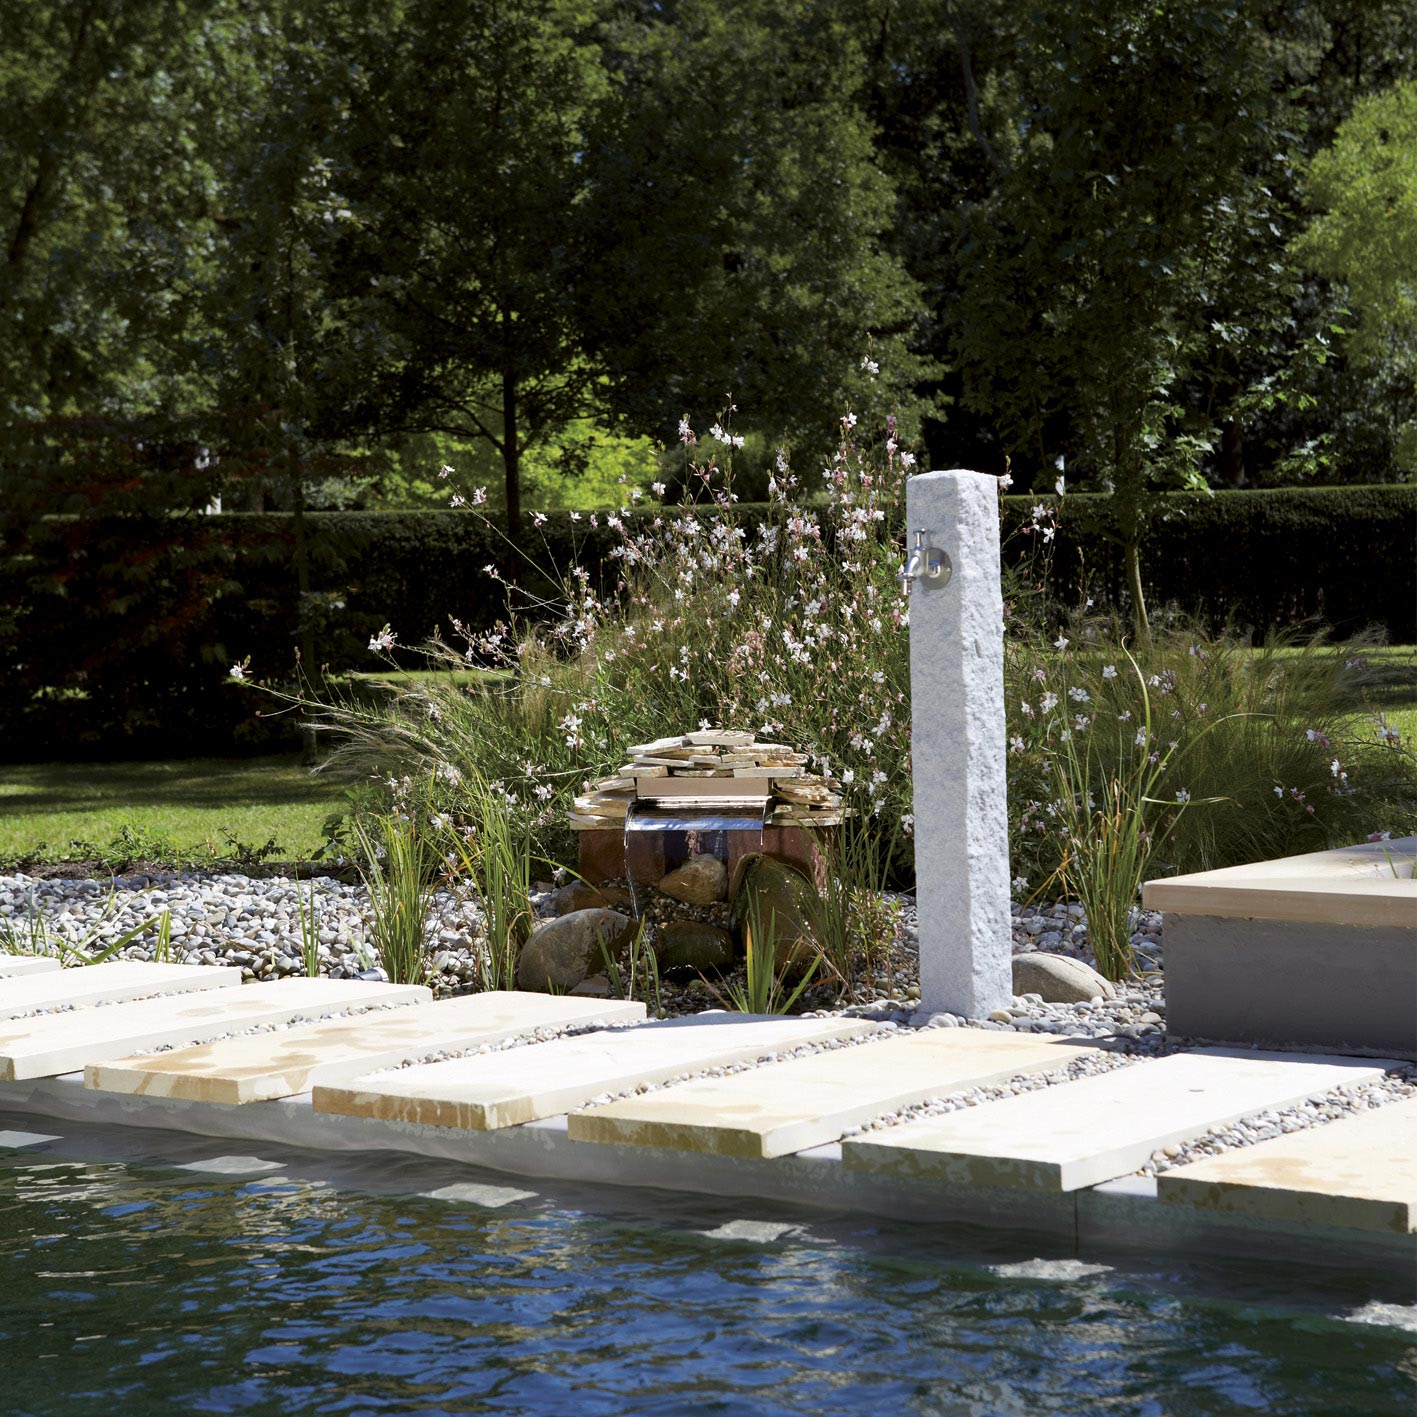 fontaine de jardin en plastique gris 356026 leroy merlin. Black Bedroom Furniture Sets. Home Design Ideas